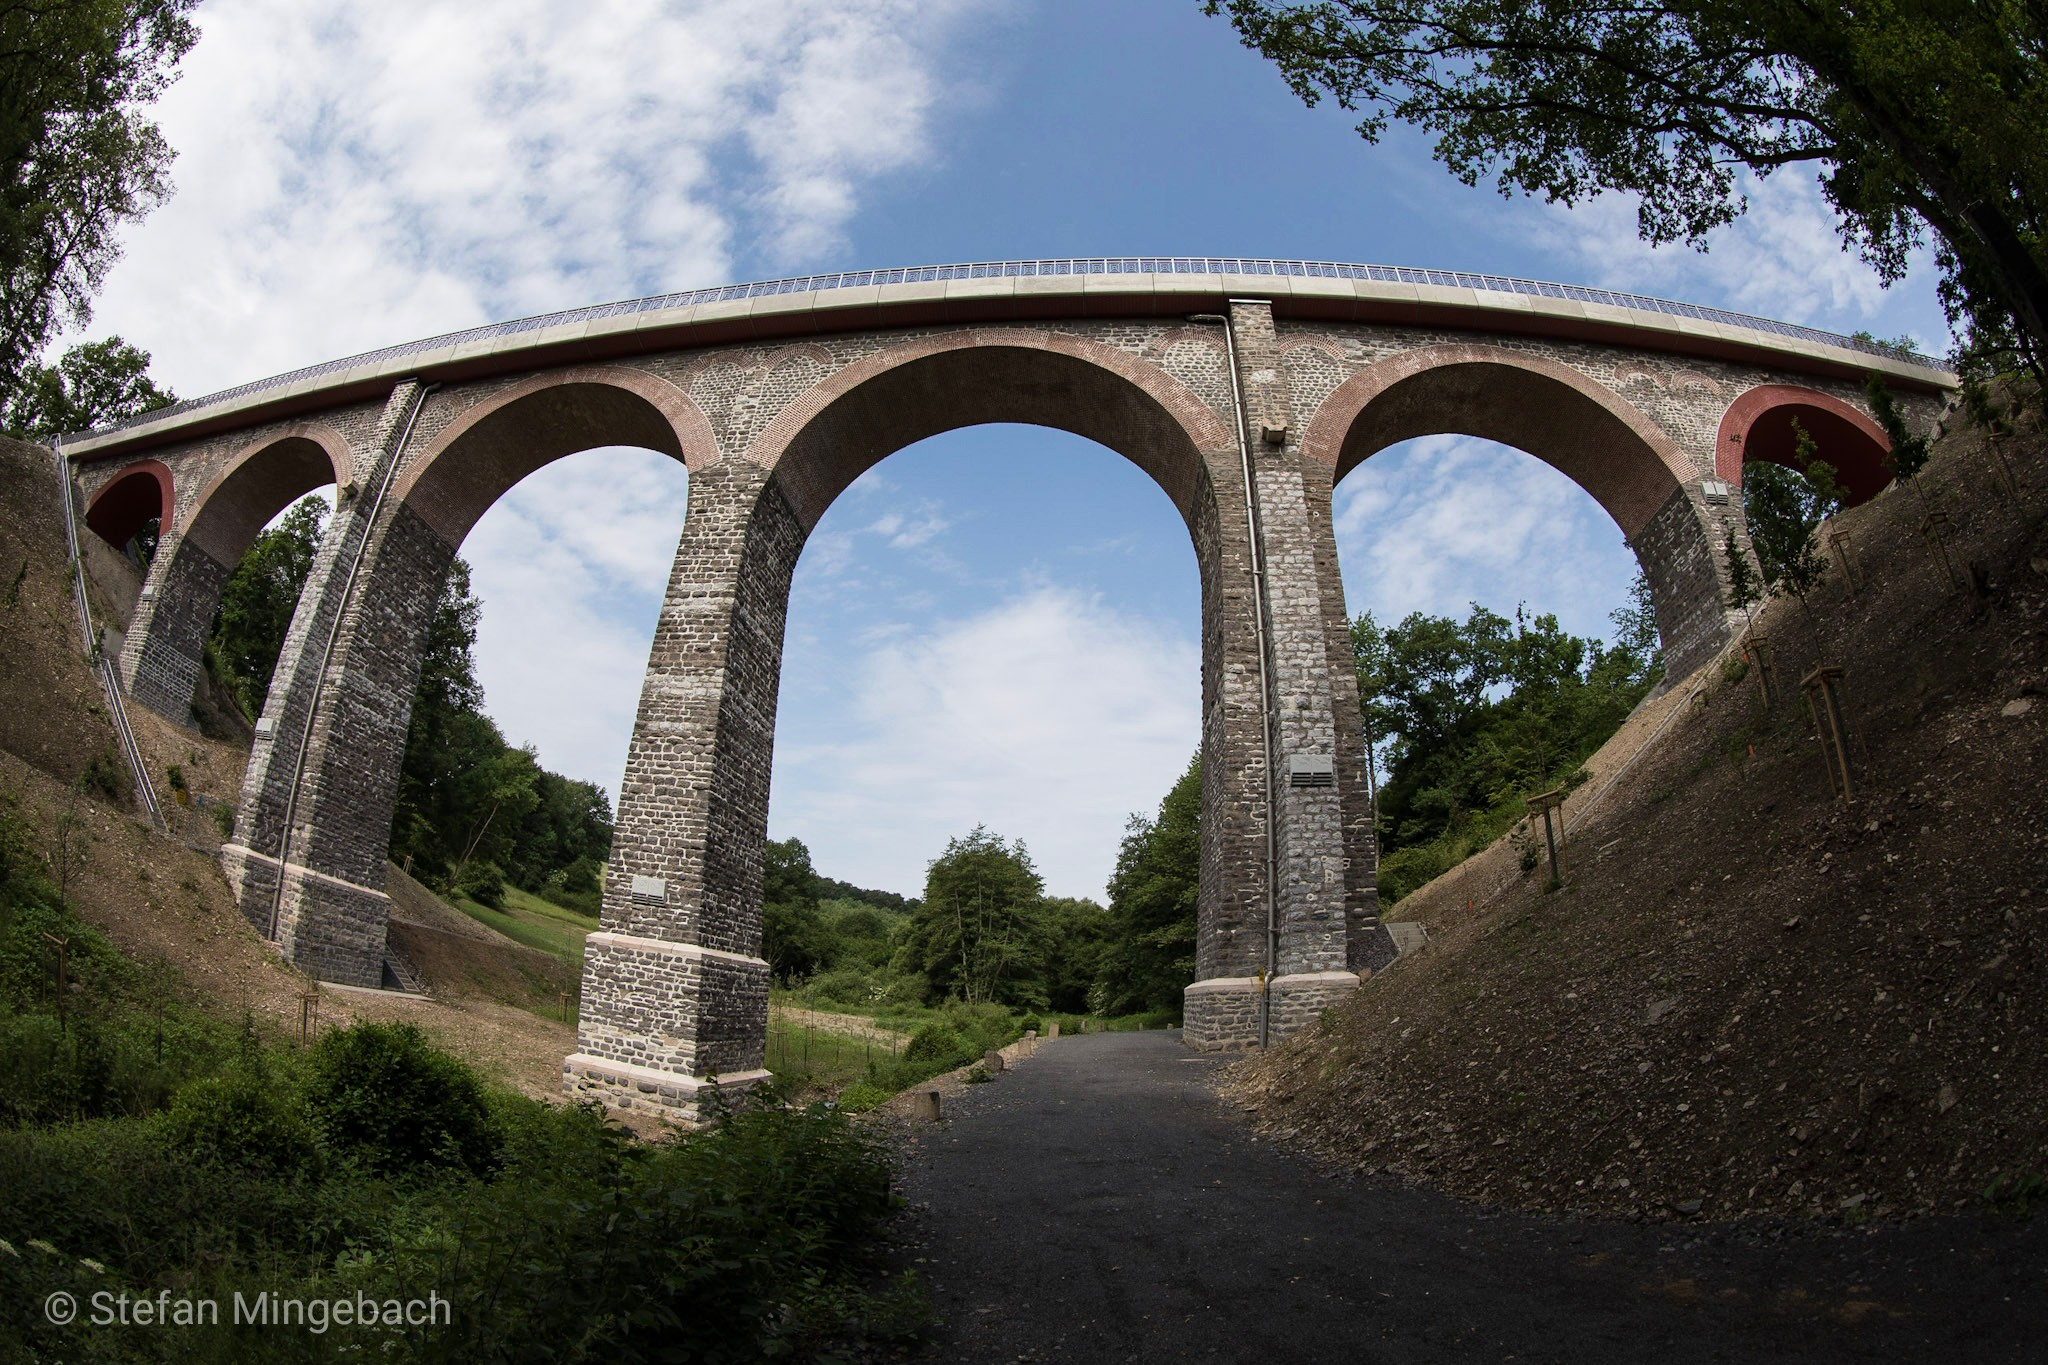 Historische Eisenbahnbrücke, Germany